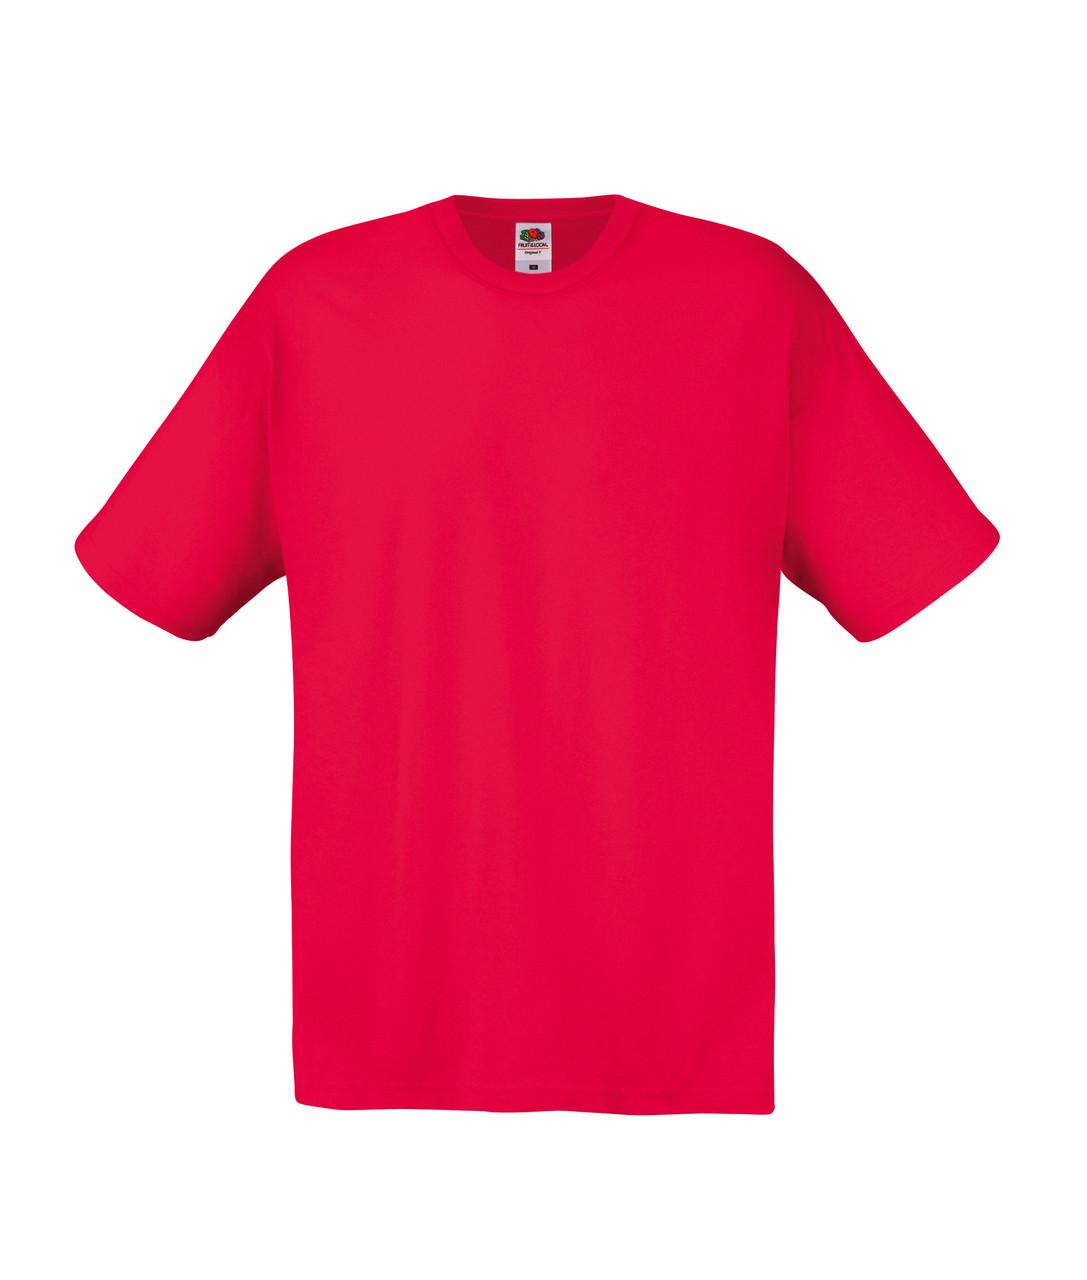 Мужская Футболка Лёгкая Fruit of the loom Красный 61-082-40 S